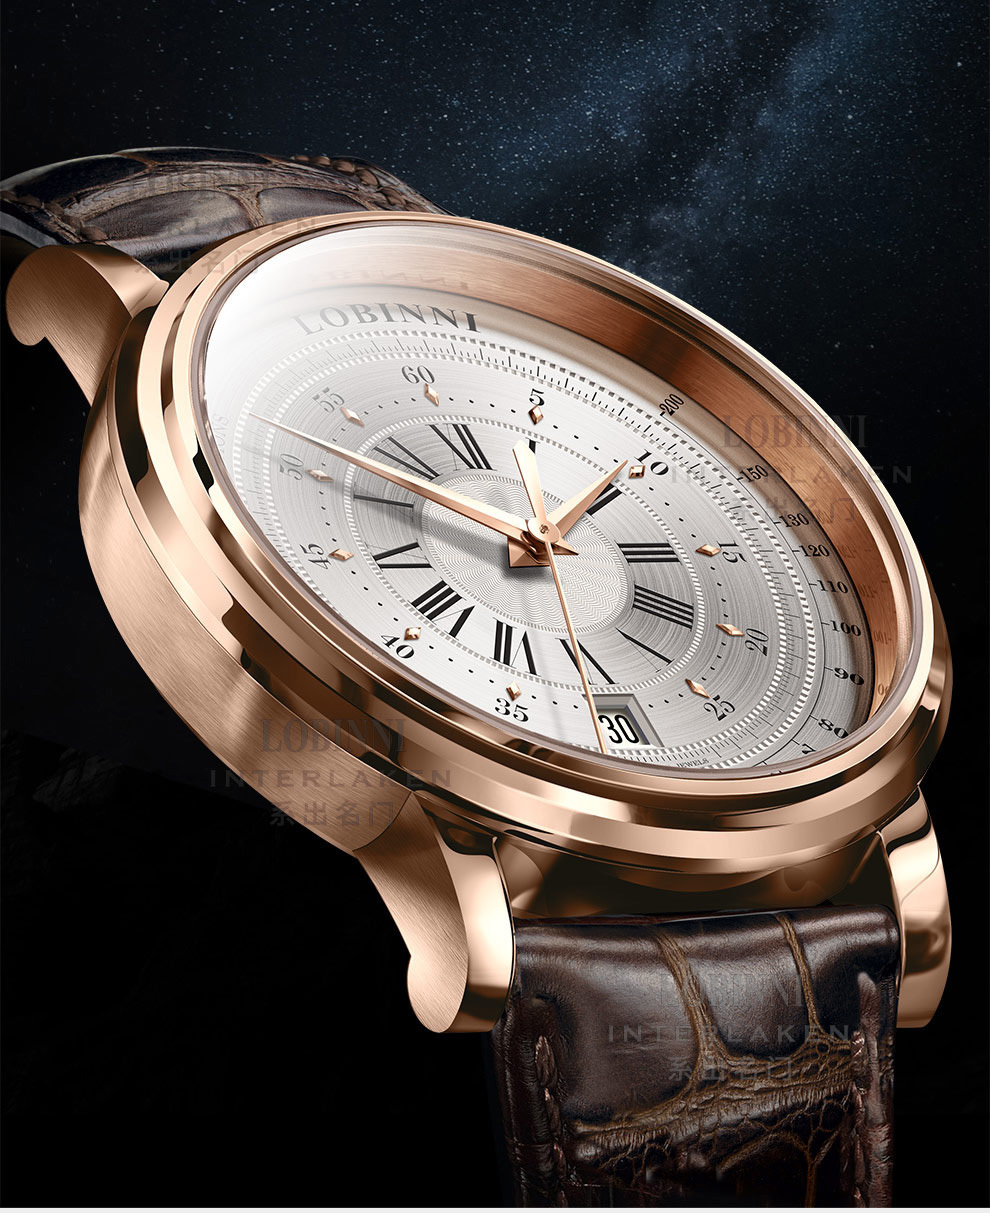 LOBINNI New Men Watches Top Luxury Brand Japan Import NH35A SII O Auto Mechanical MOVT Men's Clock Sapphire reloj hombre L1018-8 1